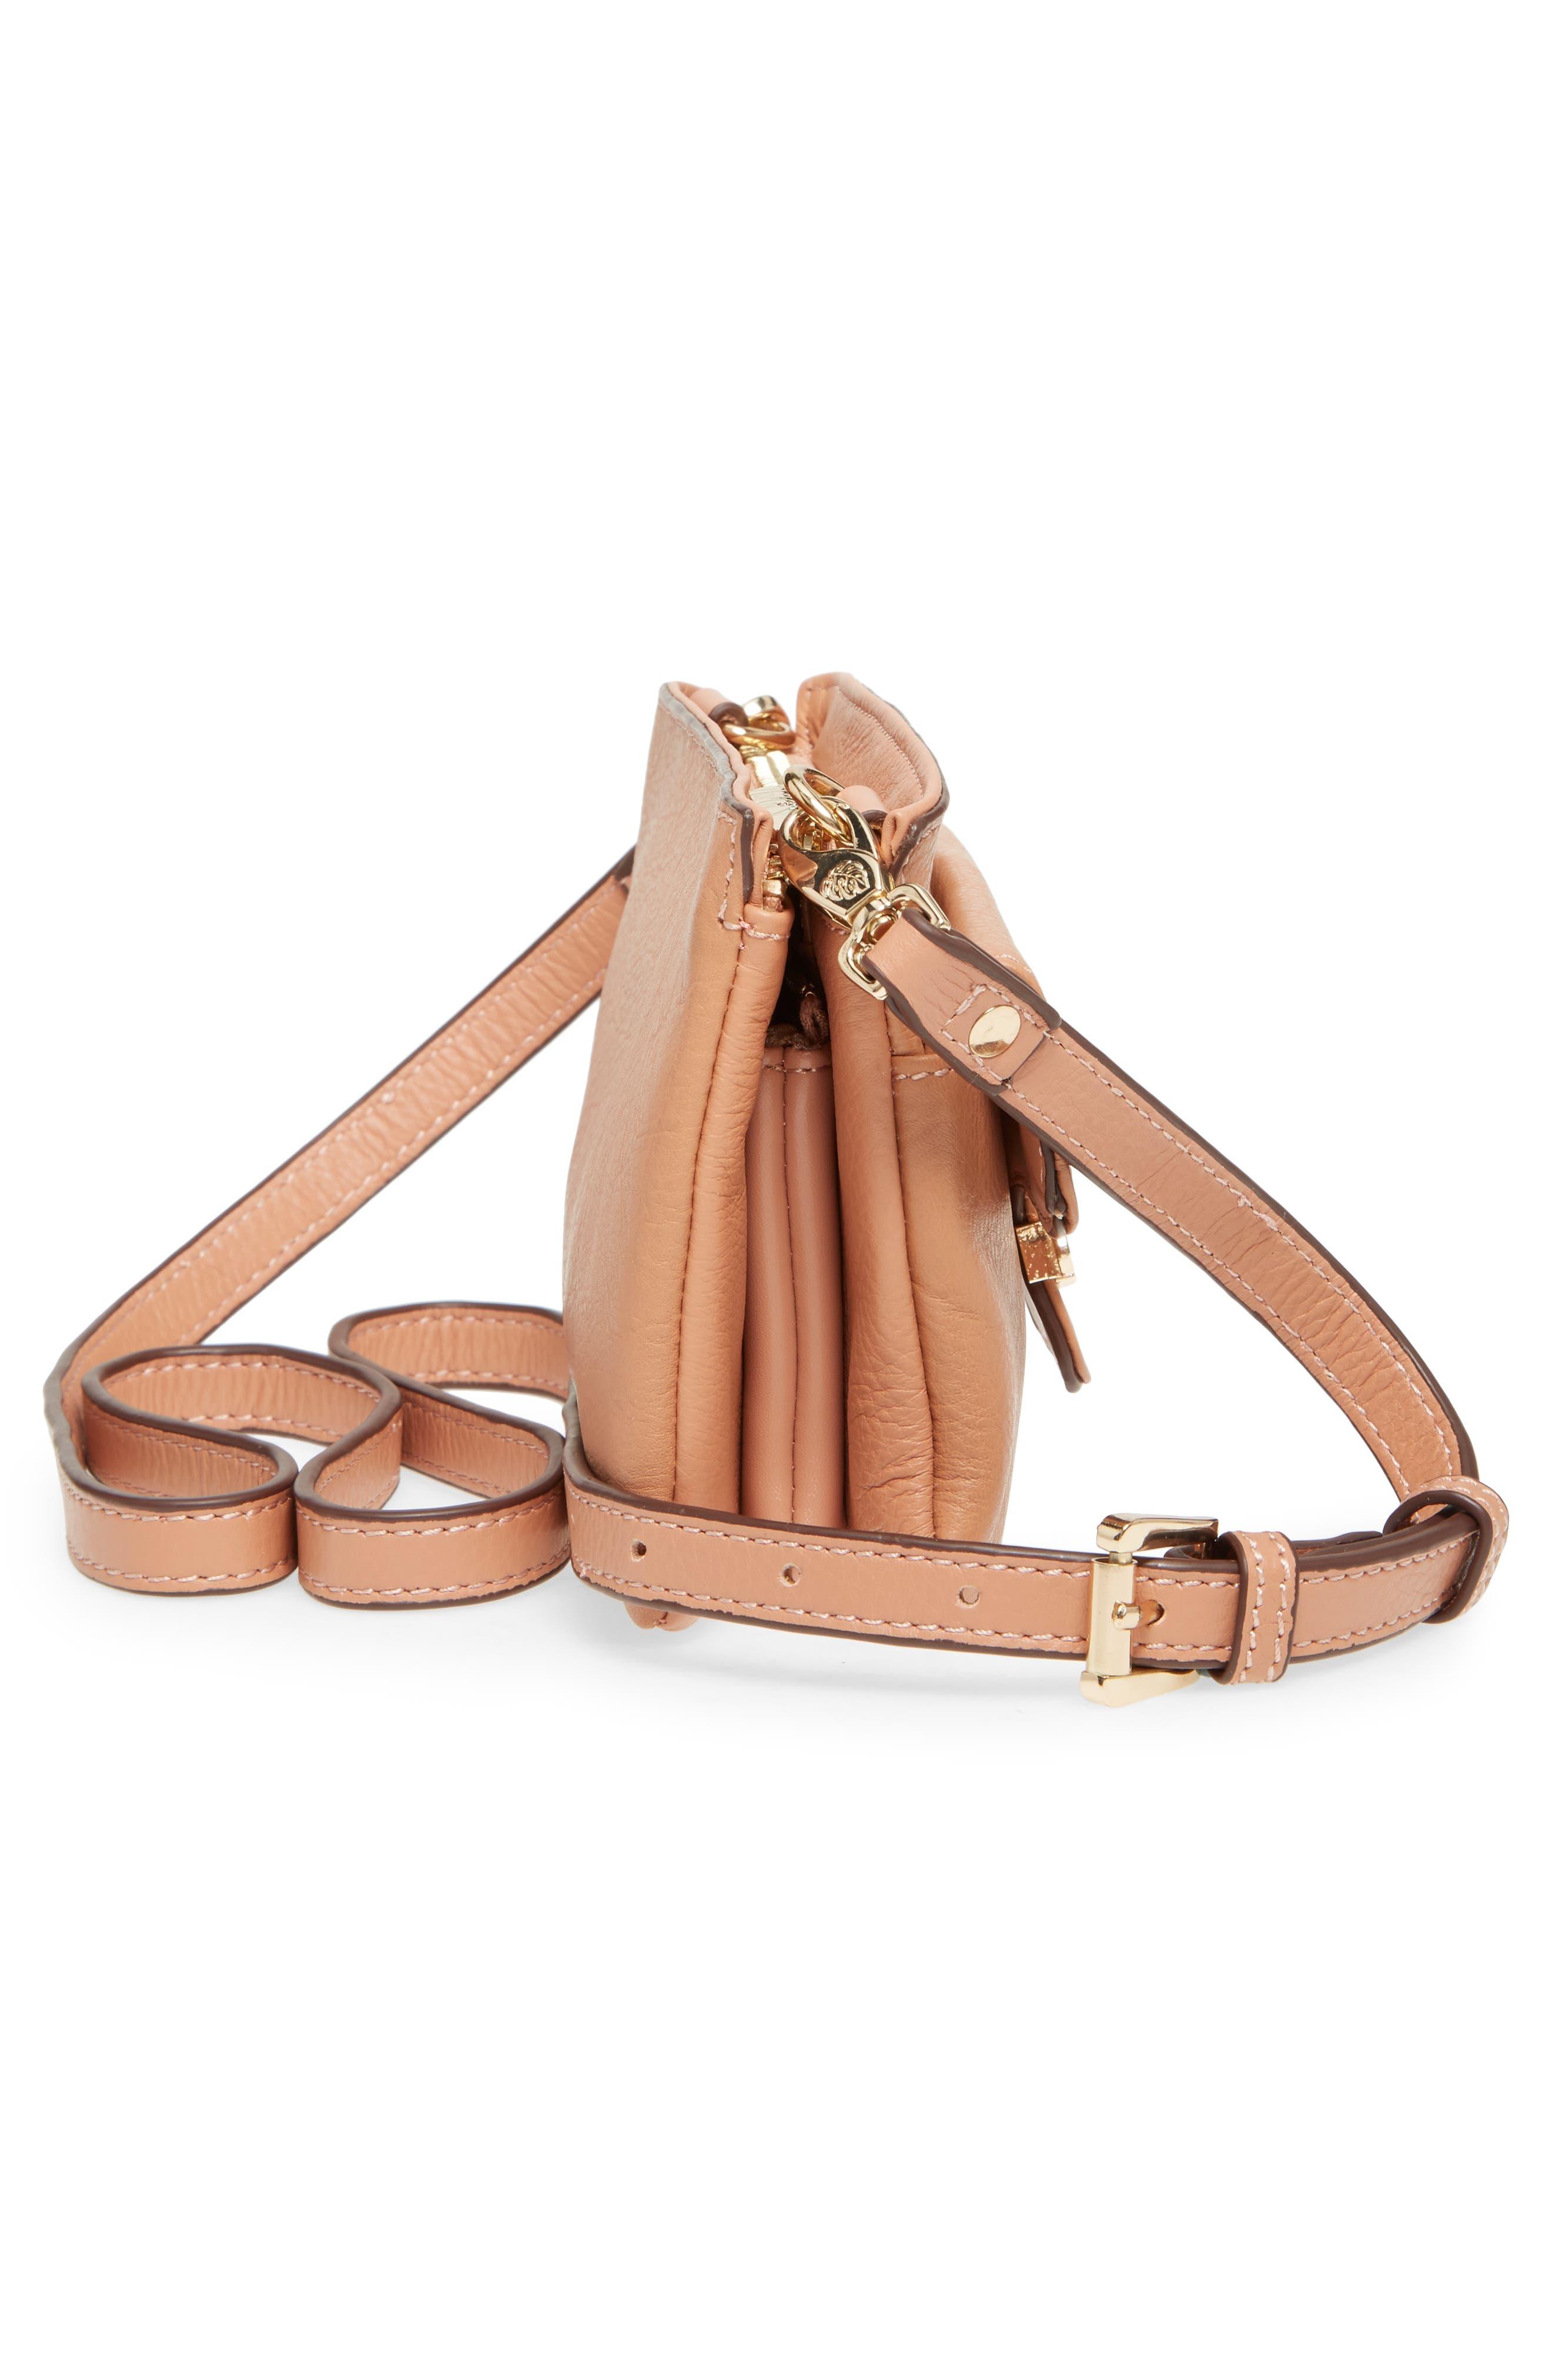 Katerini Leather Crossbody Wallet,                             Alternate thumbnail 25, color,